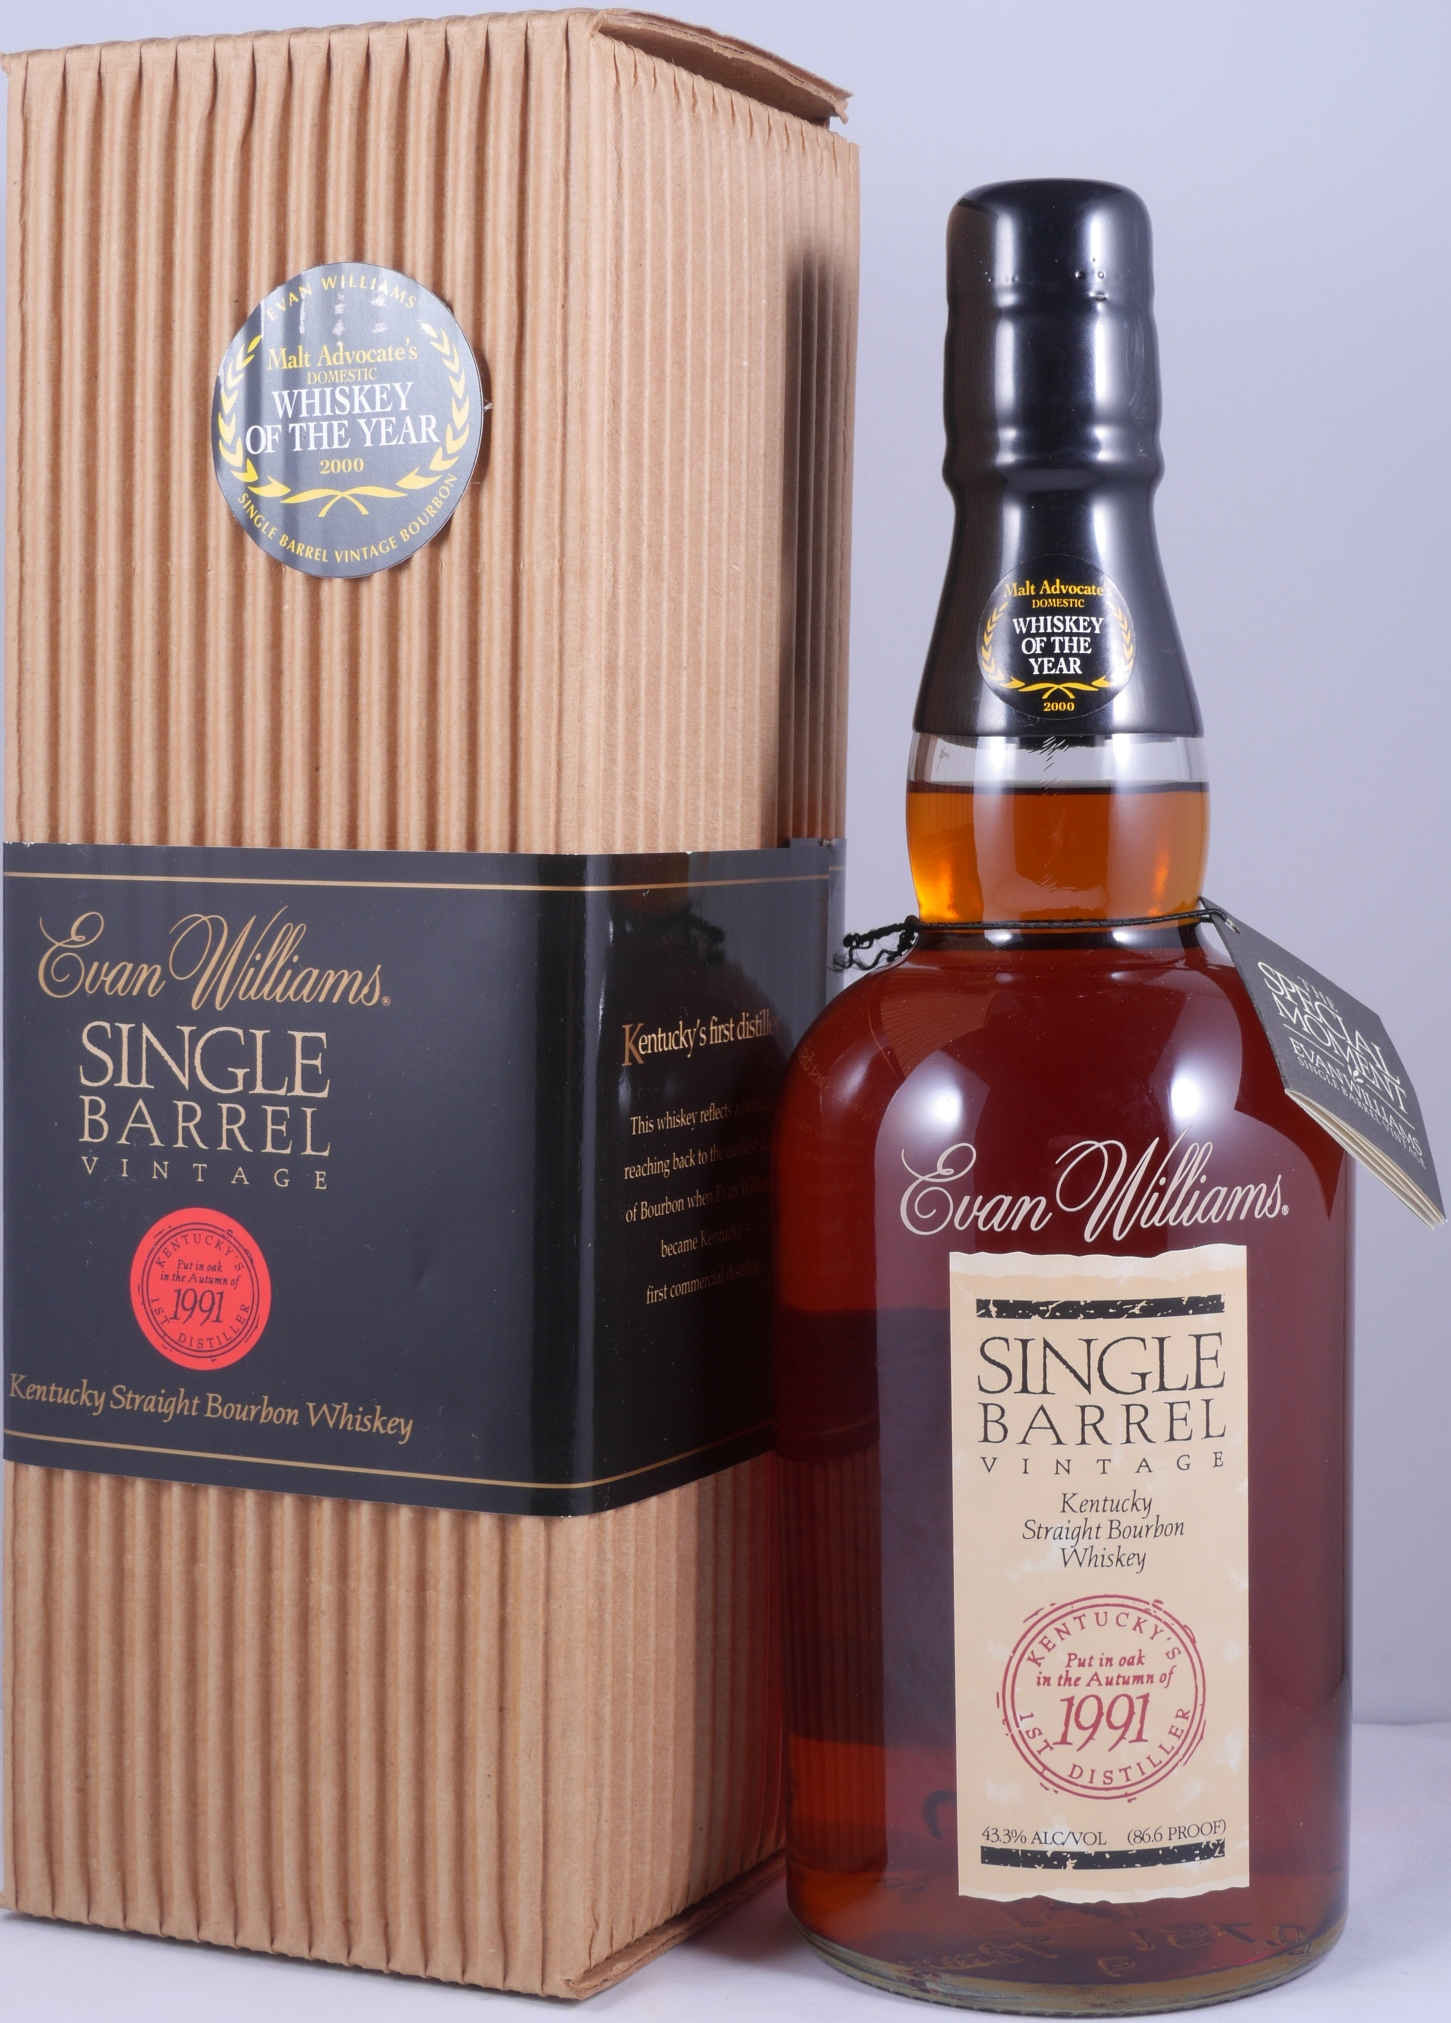 evan wiliams single barrel vintage